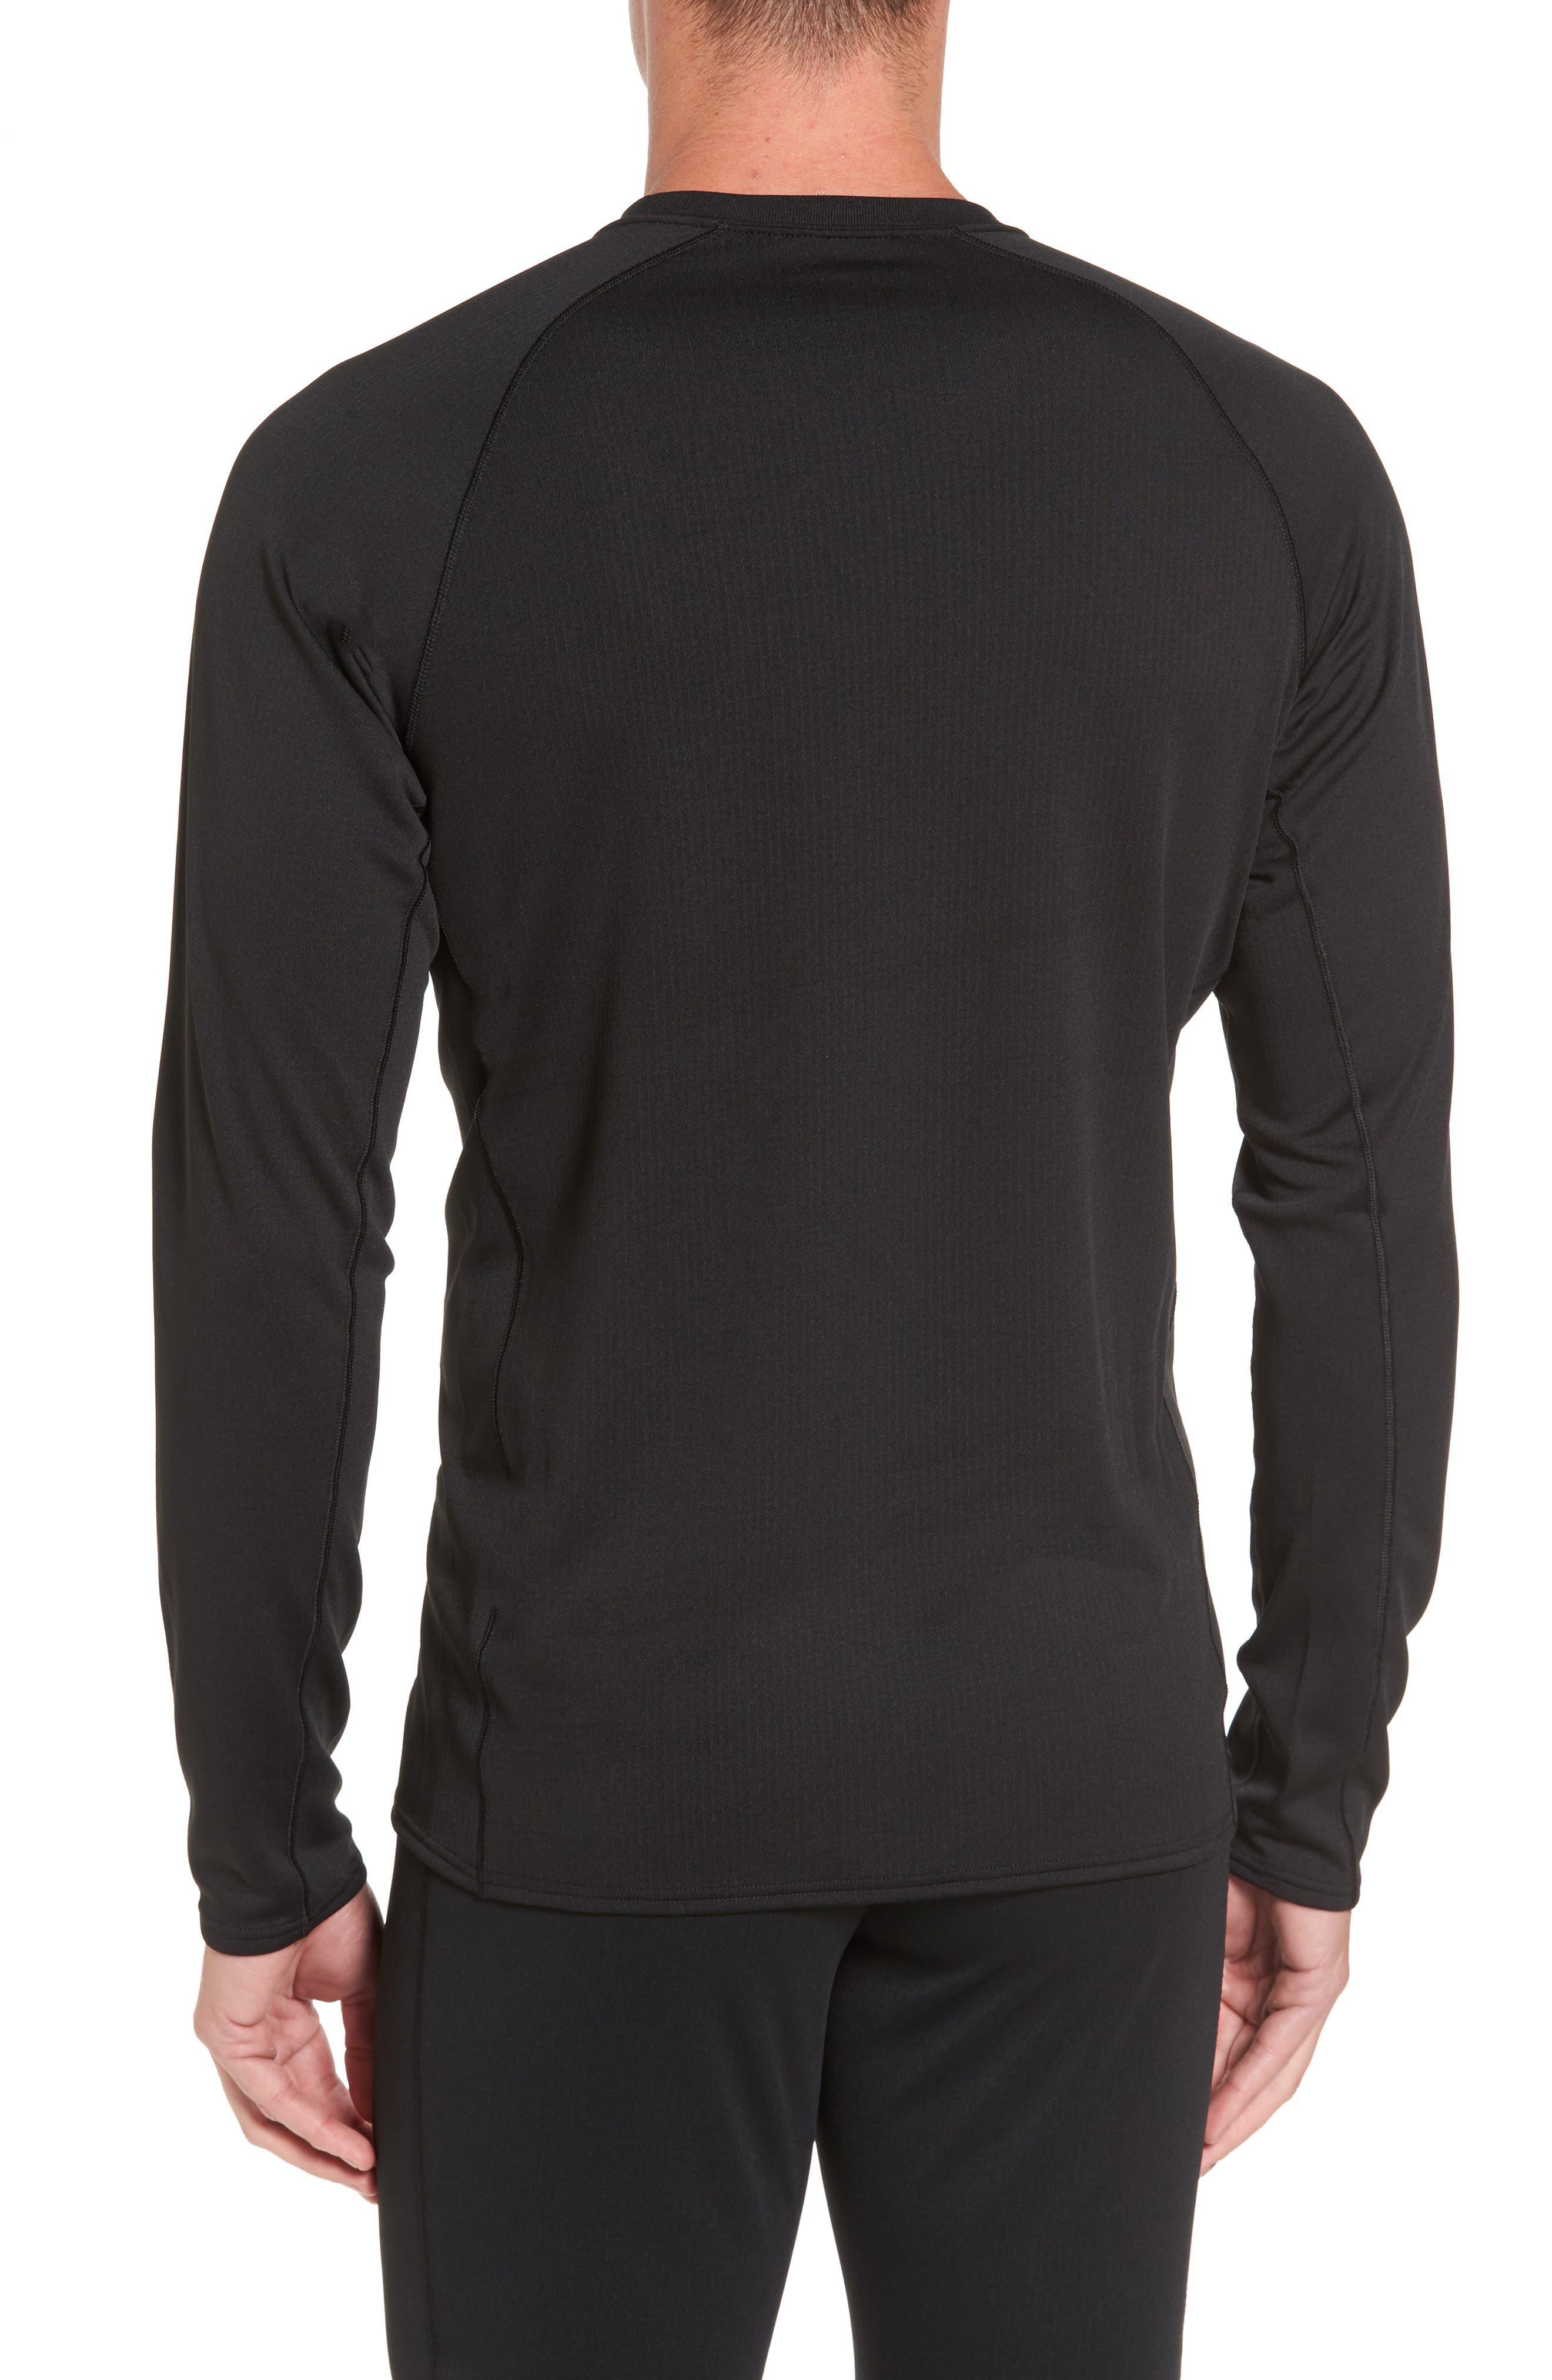 Capilene Midweight Base Layer T-Shirt,                             Alternate thumbnail 2, color,                             001